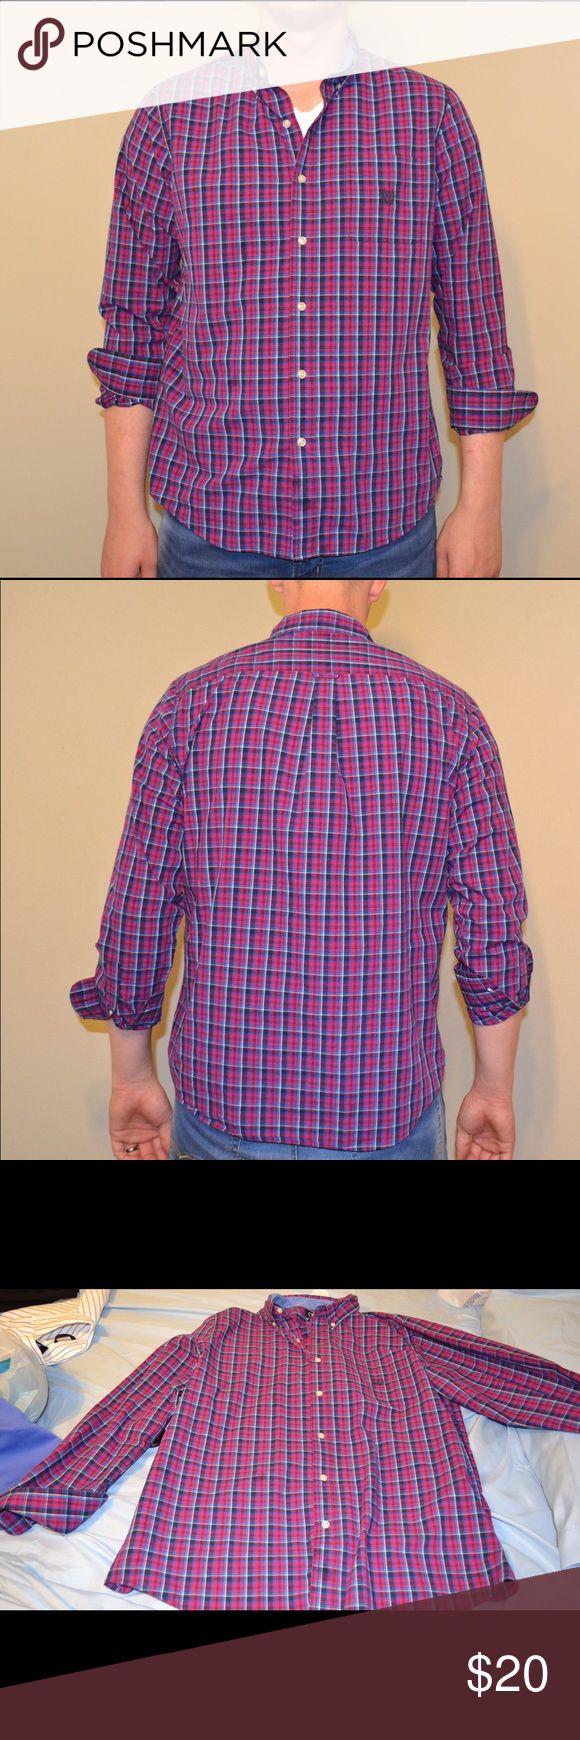 Men's Chaps Plaid Button Down Practically new men's Chaps plaid button down in purple/blue. Chaps Shirts Casual Button Down Shirts